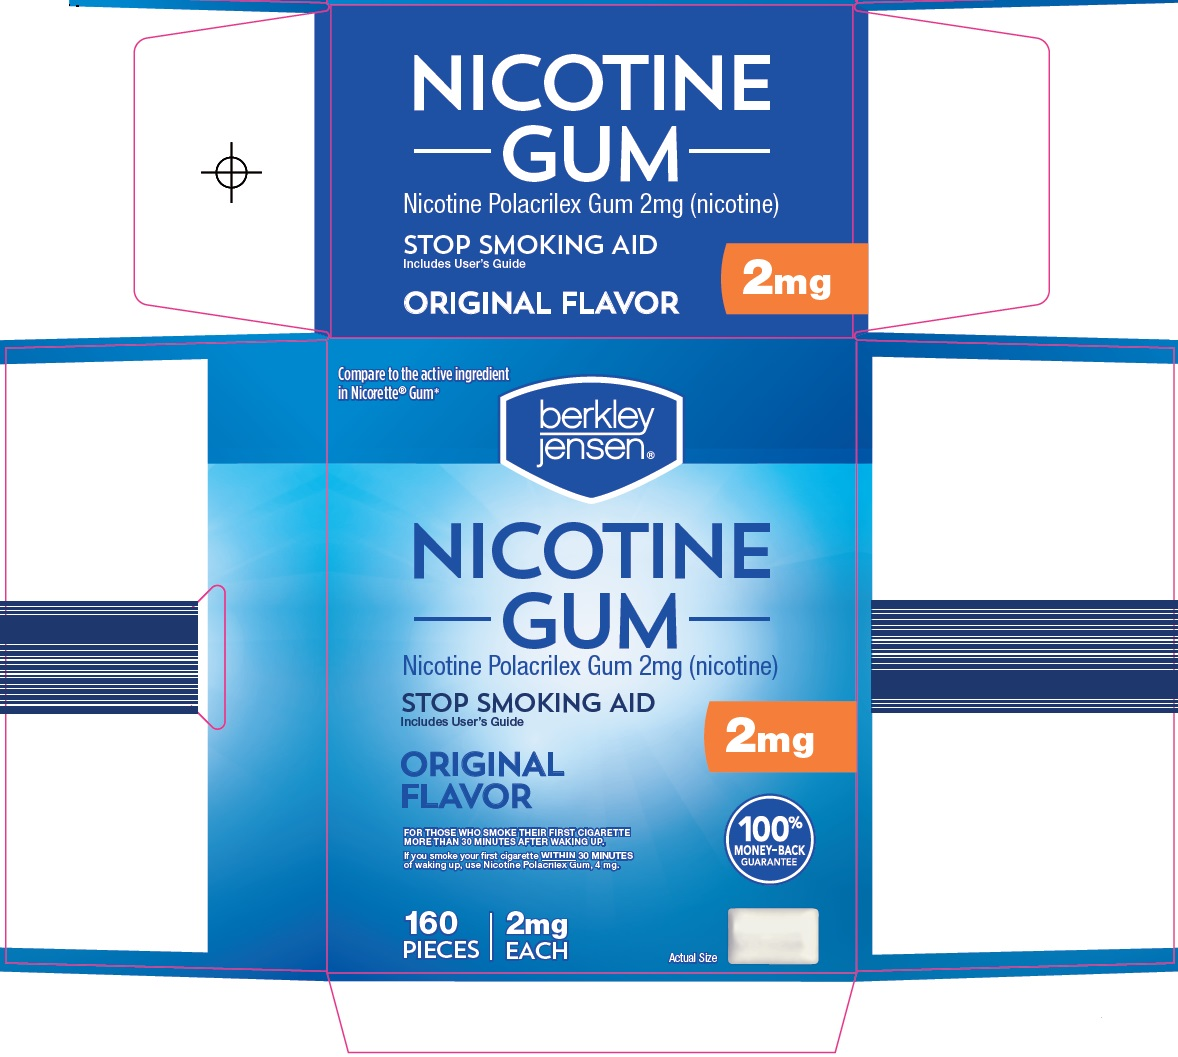 029d3-nicotine-gum-carton-image-1